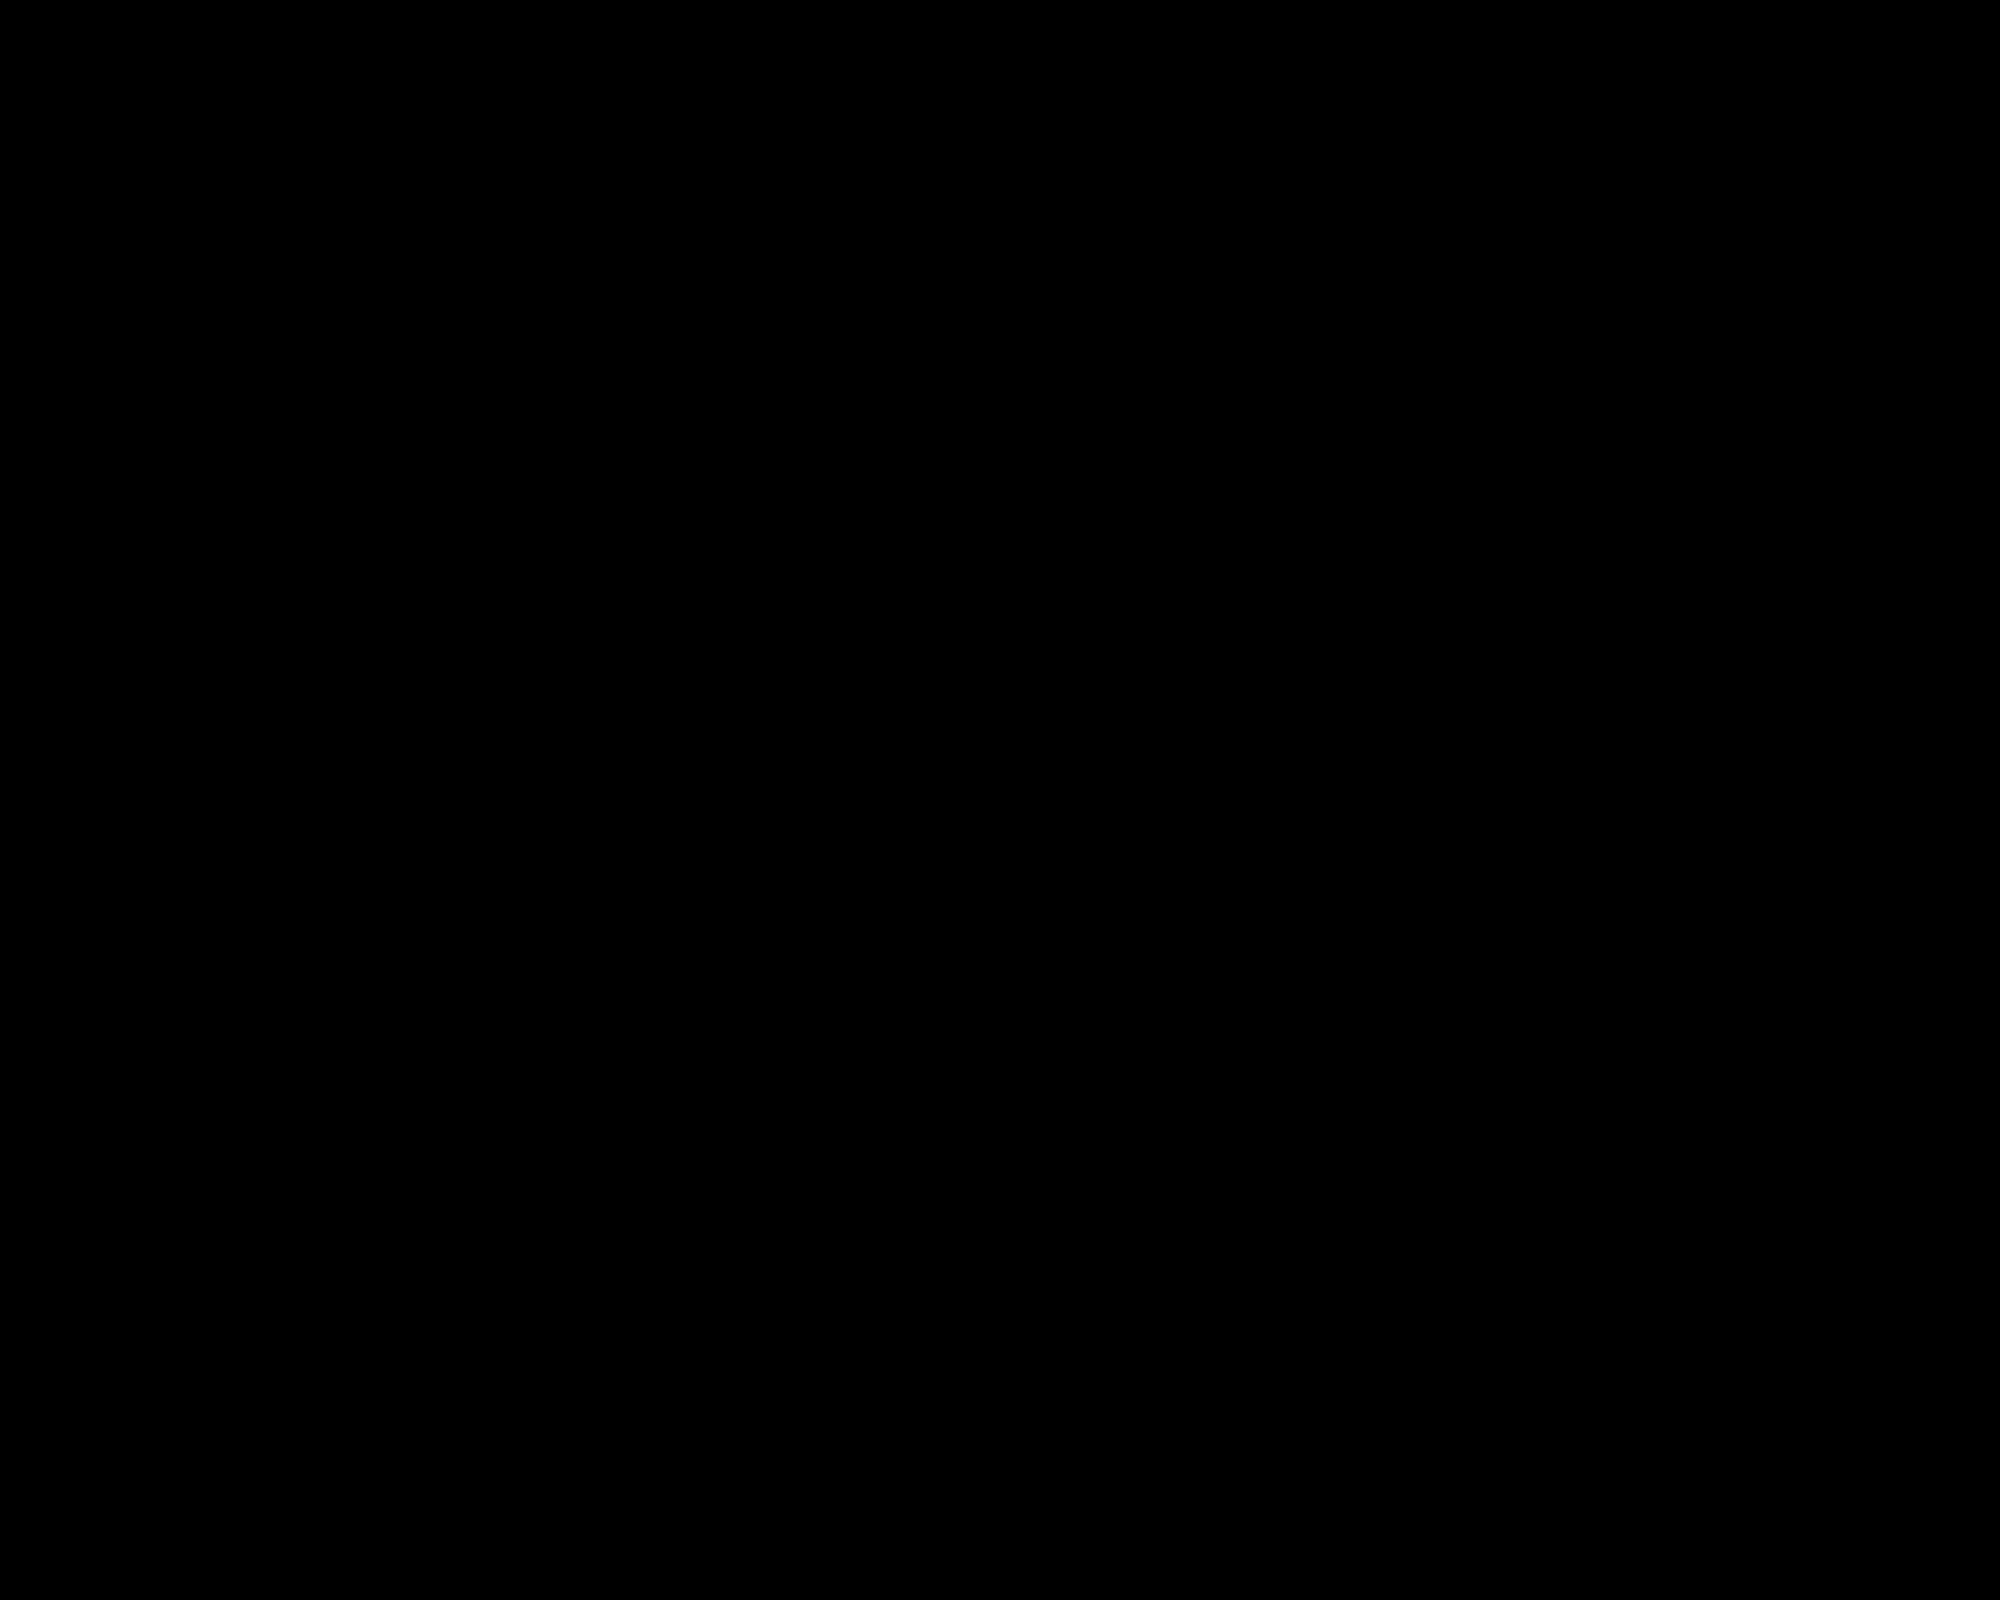 Symbol Of Rheostat.